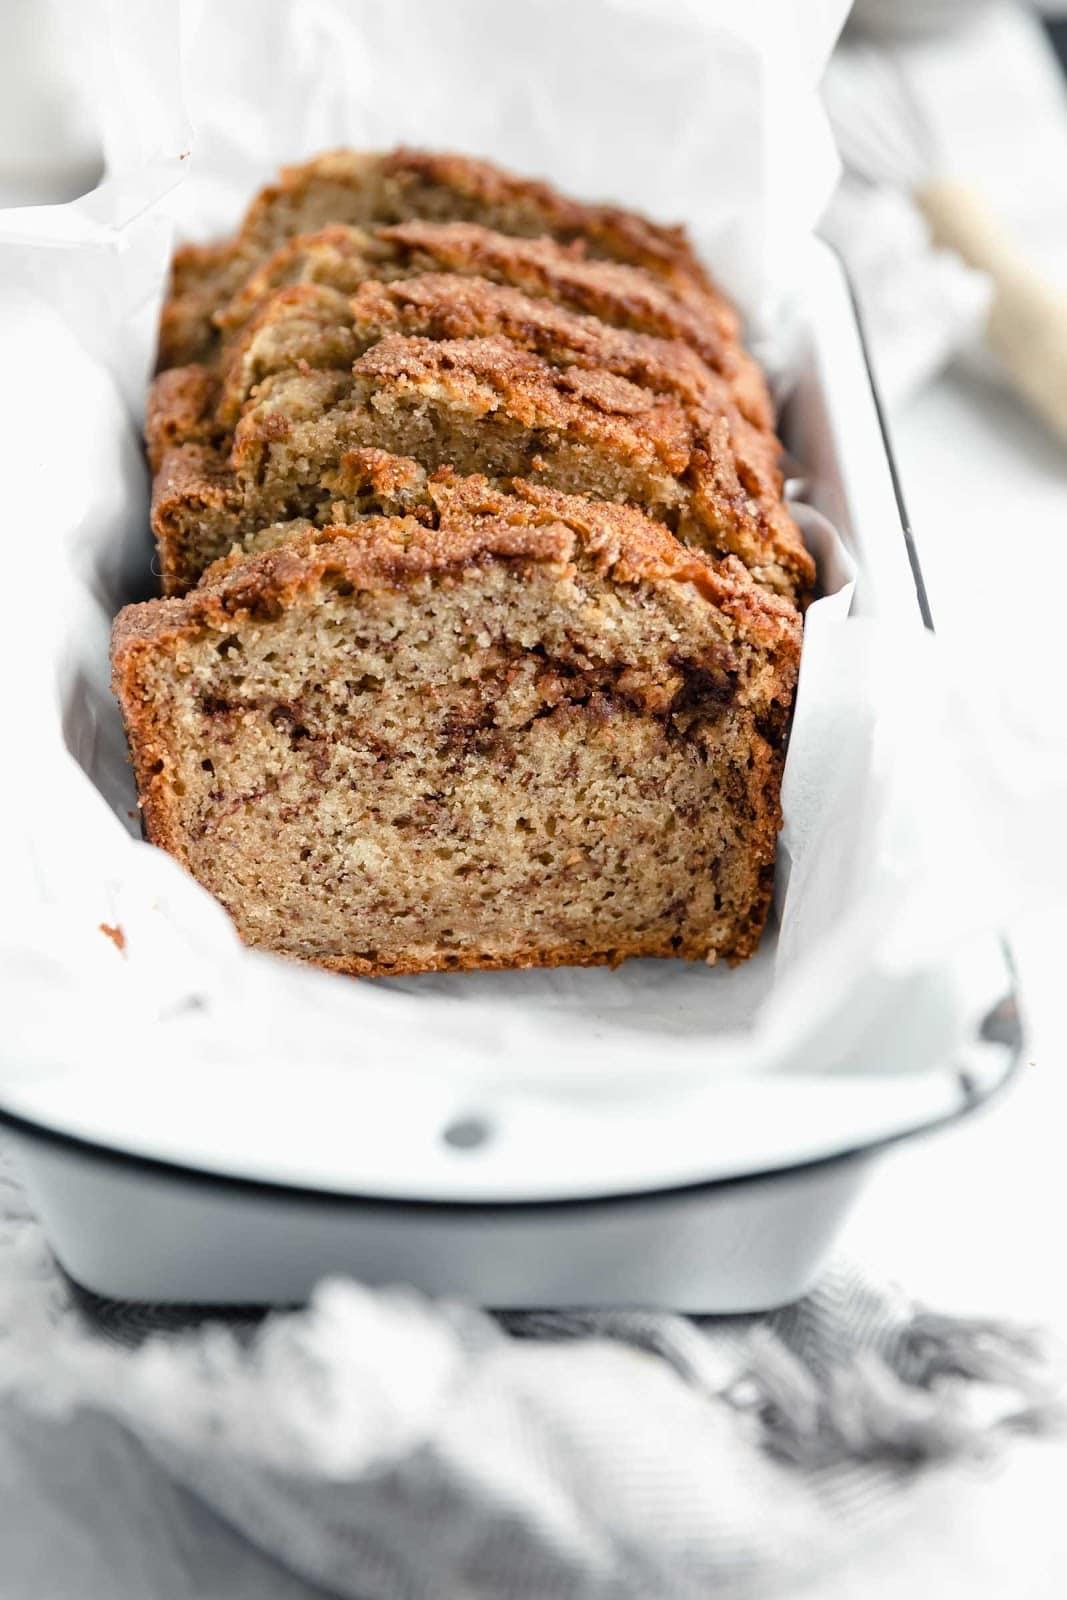 cinnamon sugar banana bread with cinnamon swirl in loaf pan